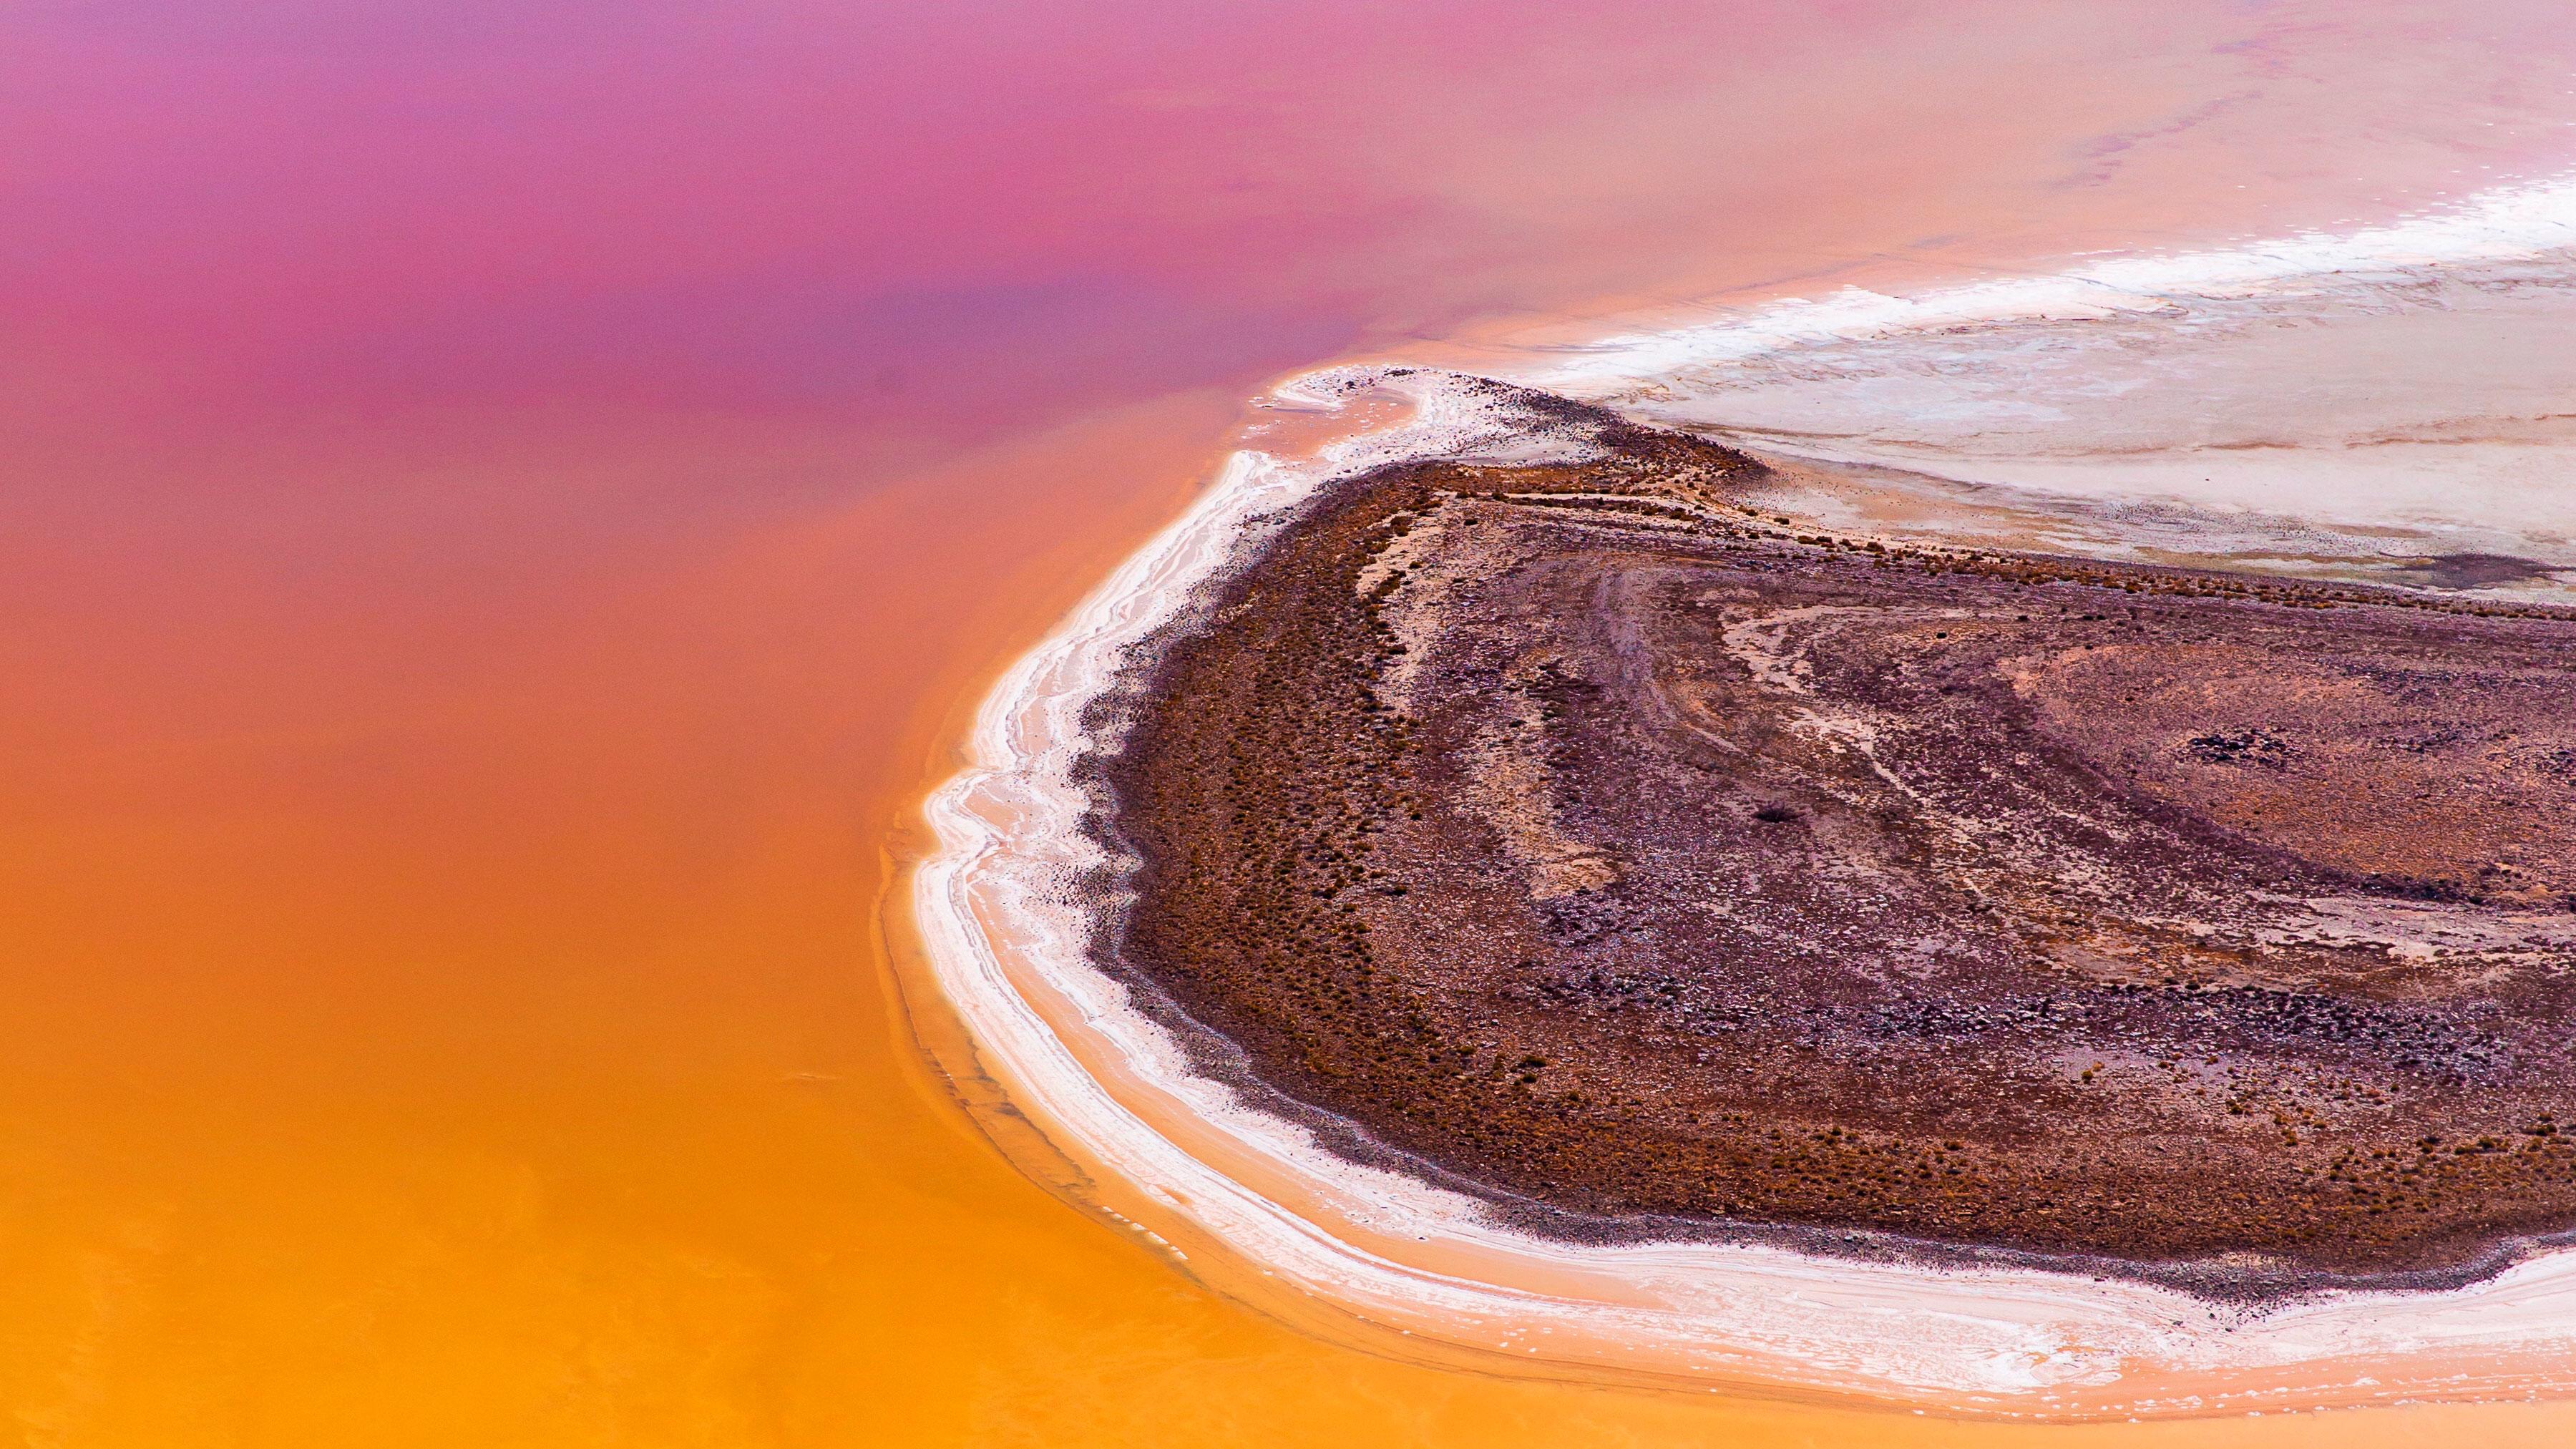 Kati Thanda-Lake Eyre in Australia blooms in dazzling colors   CNN Travel